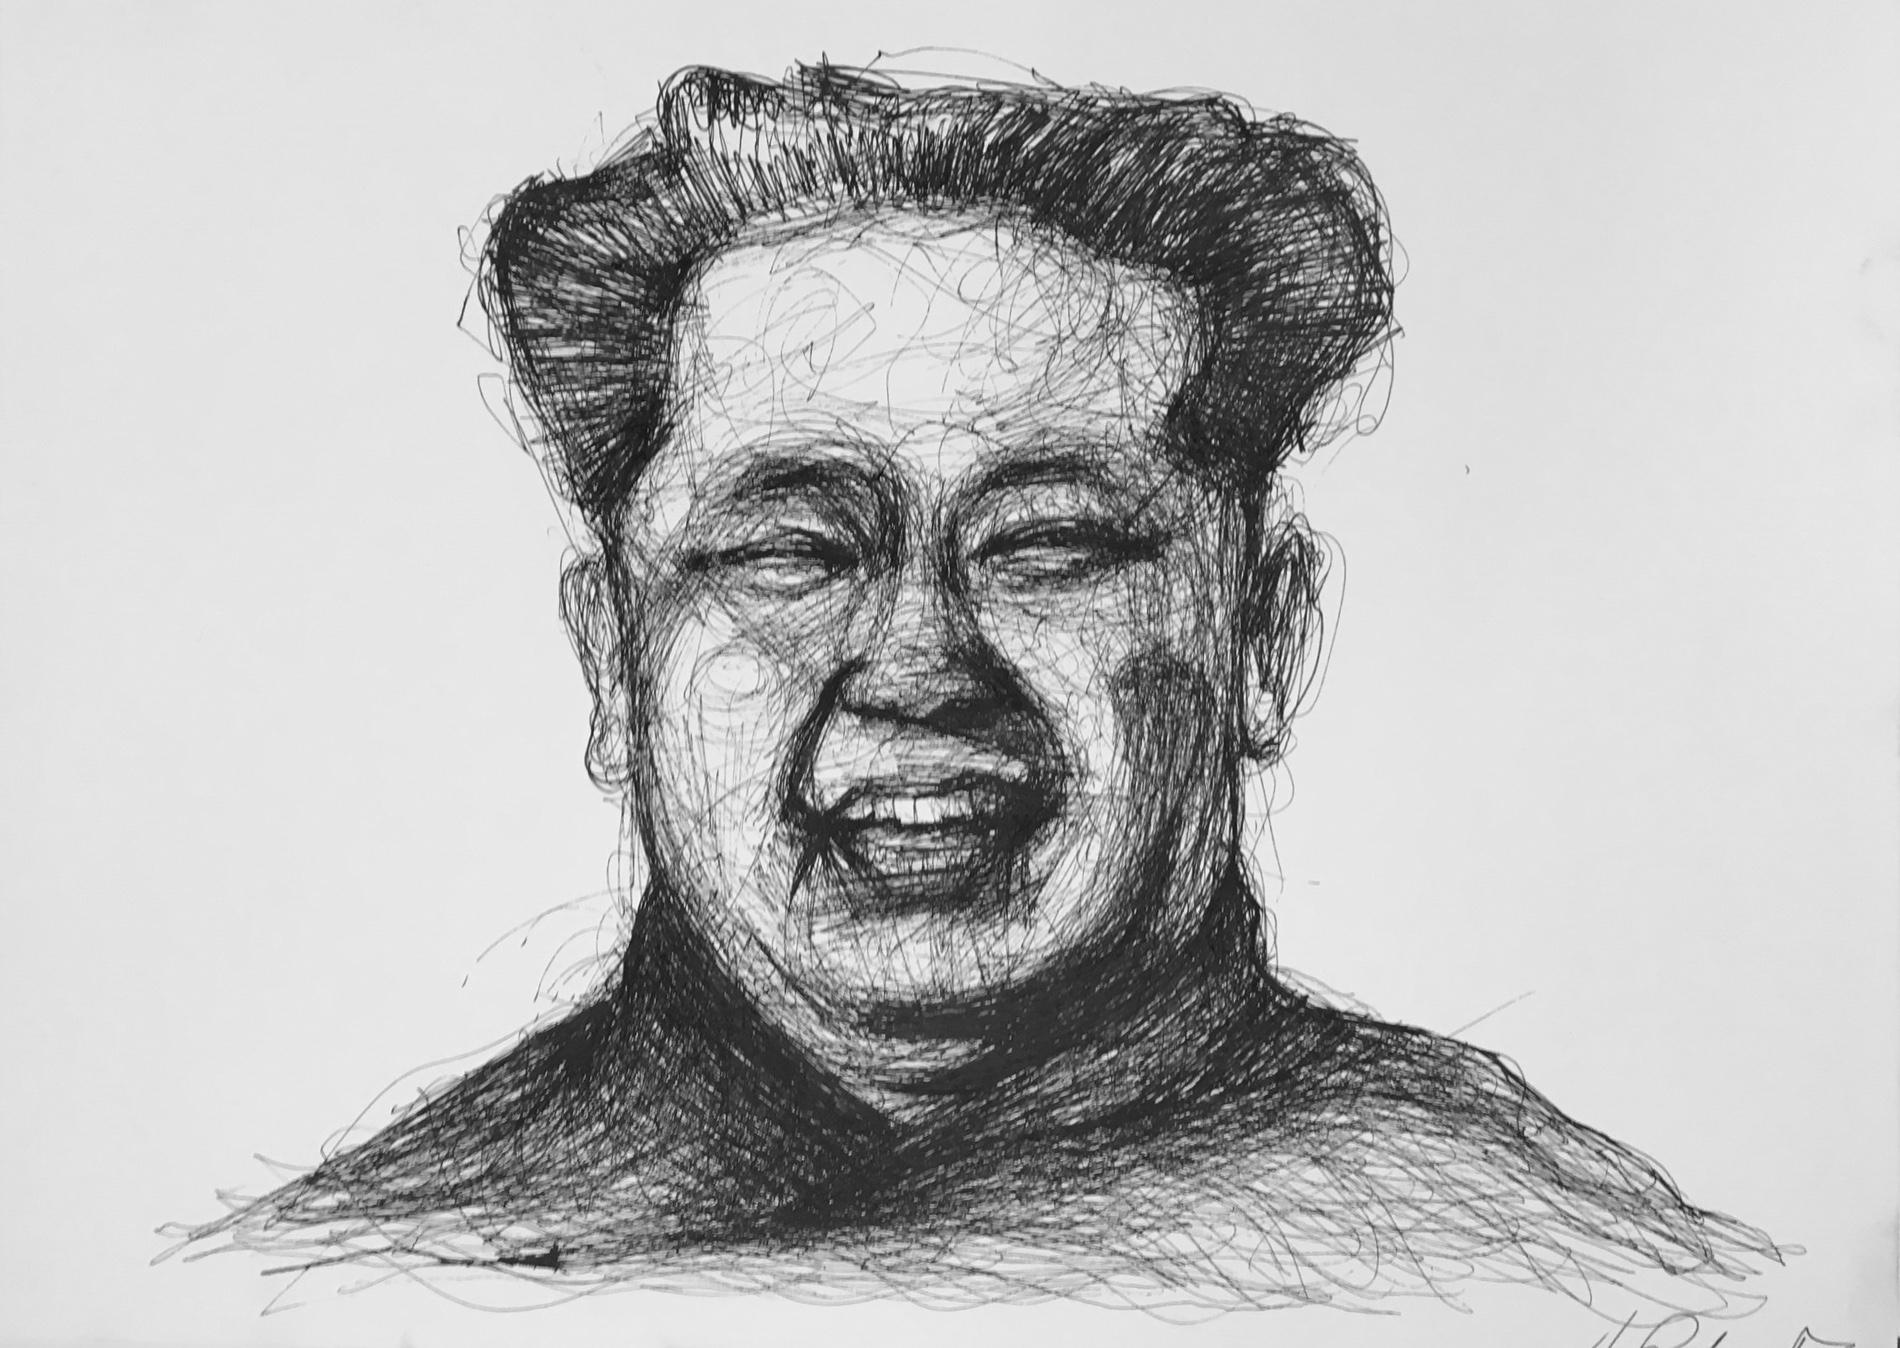 Lil' Kim, 2017 |Pen on paper |29.7 x 41.3 cm